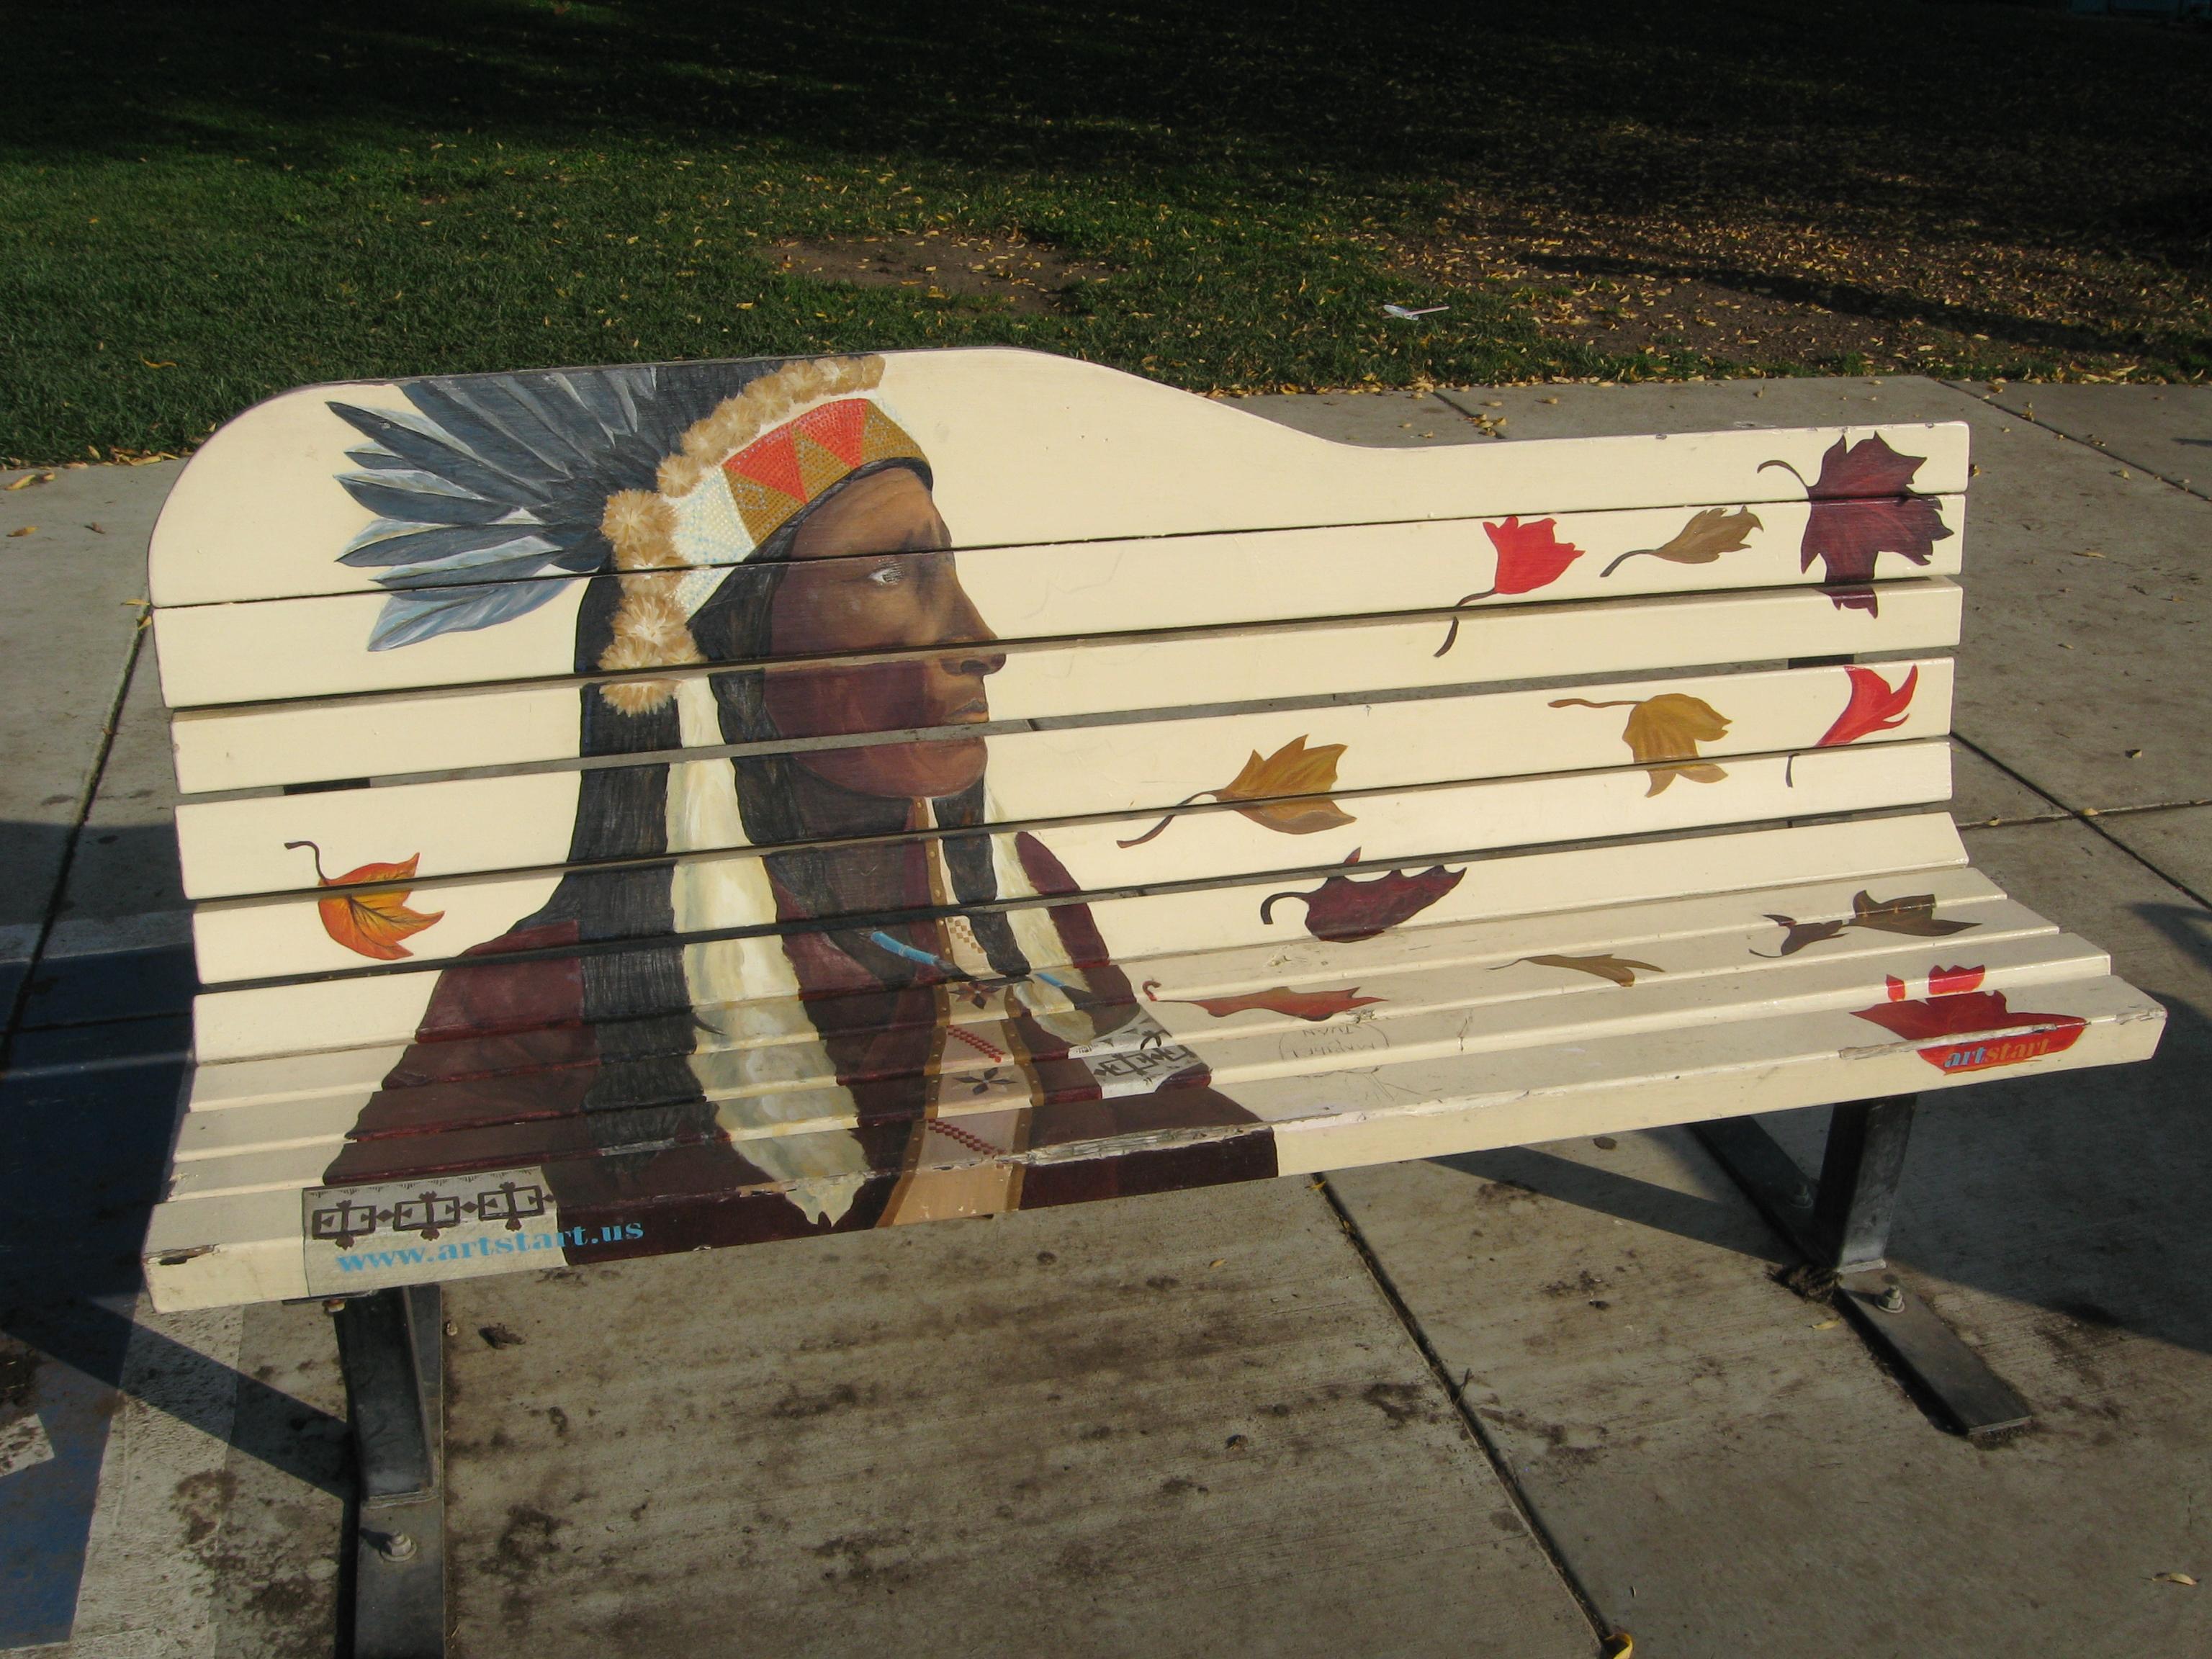 Franklin Park Art Bench